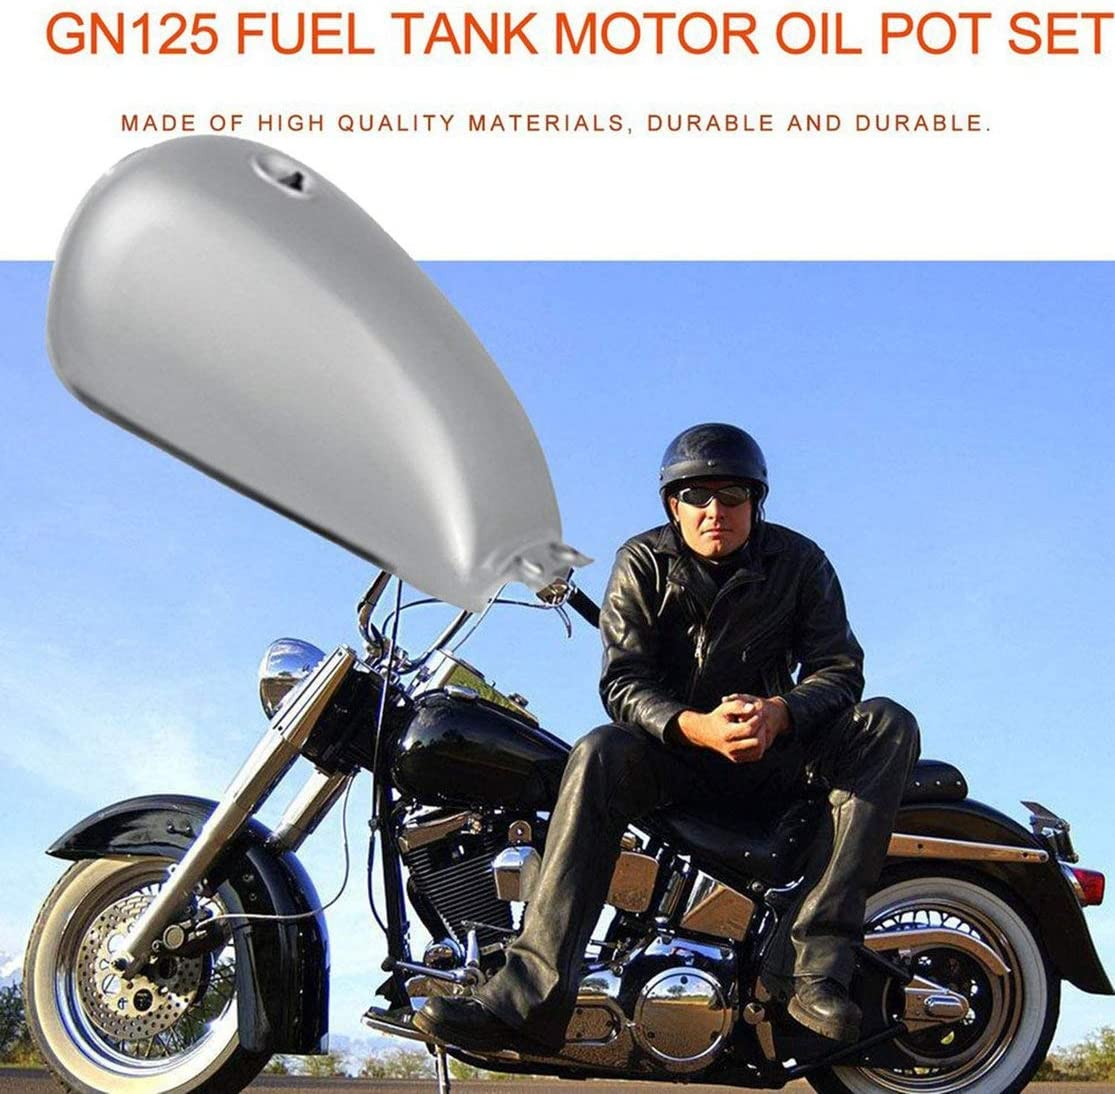 Color:Silver Kaemma Tanque de Gas Cafe Racer de Alto Rendimiento Tanque de Combustible de Hierro Universal Bobber para Suzuki GN125 GN250 GN F/ácil de Instalar